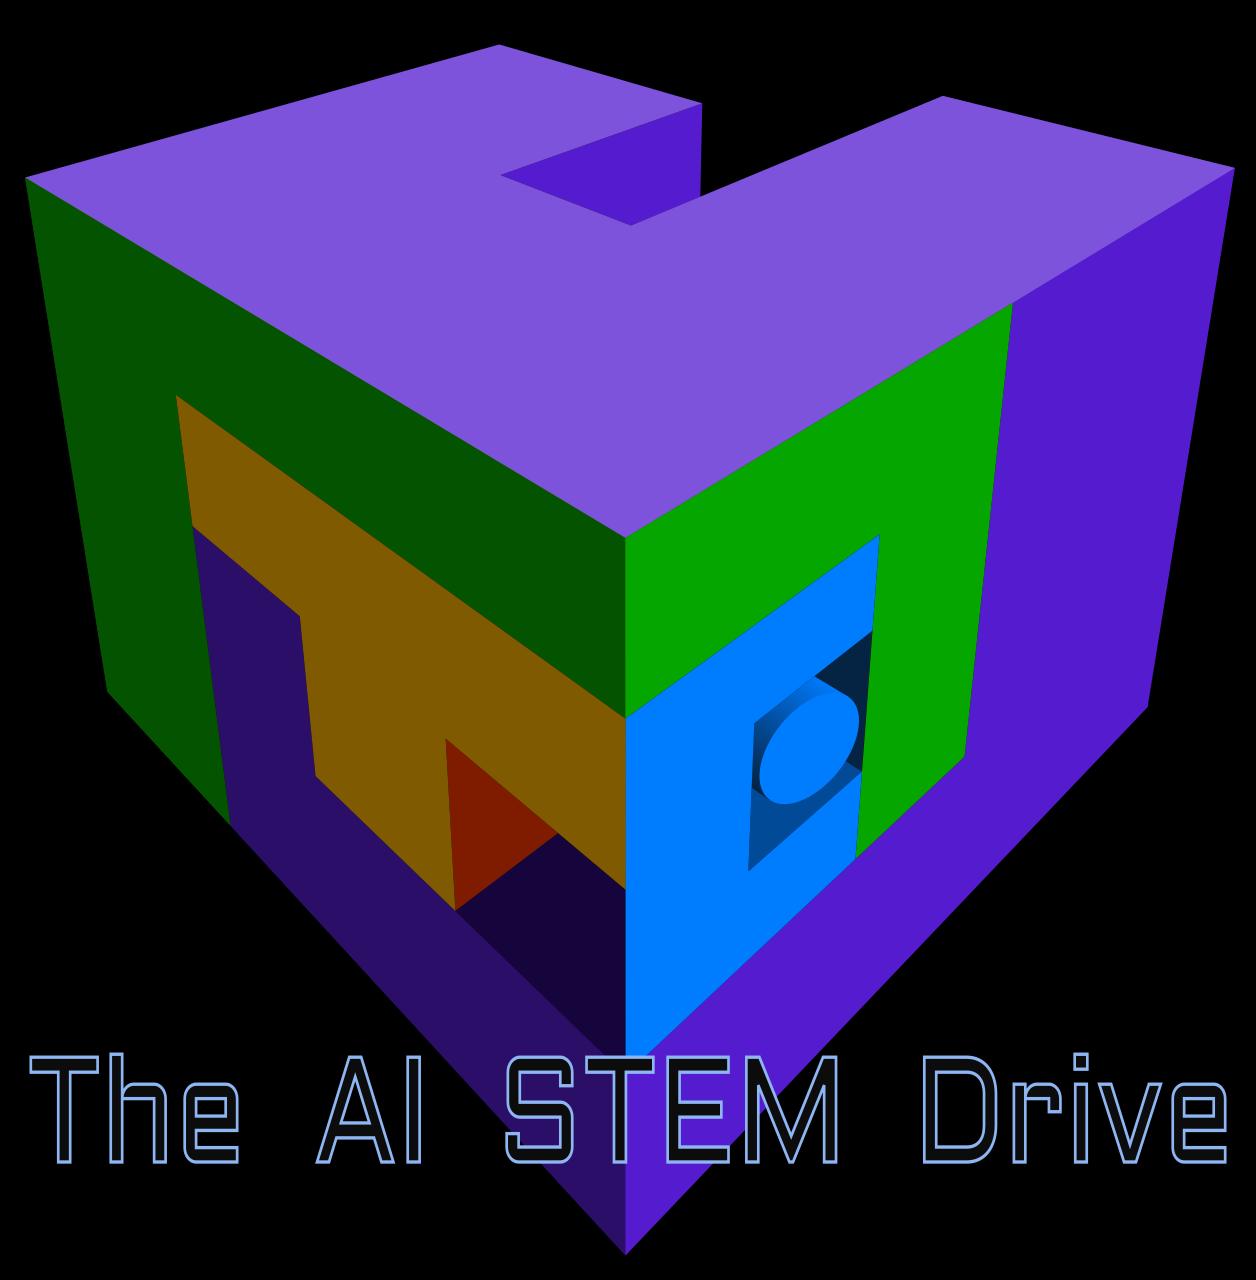 The AI STEM Drive